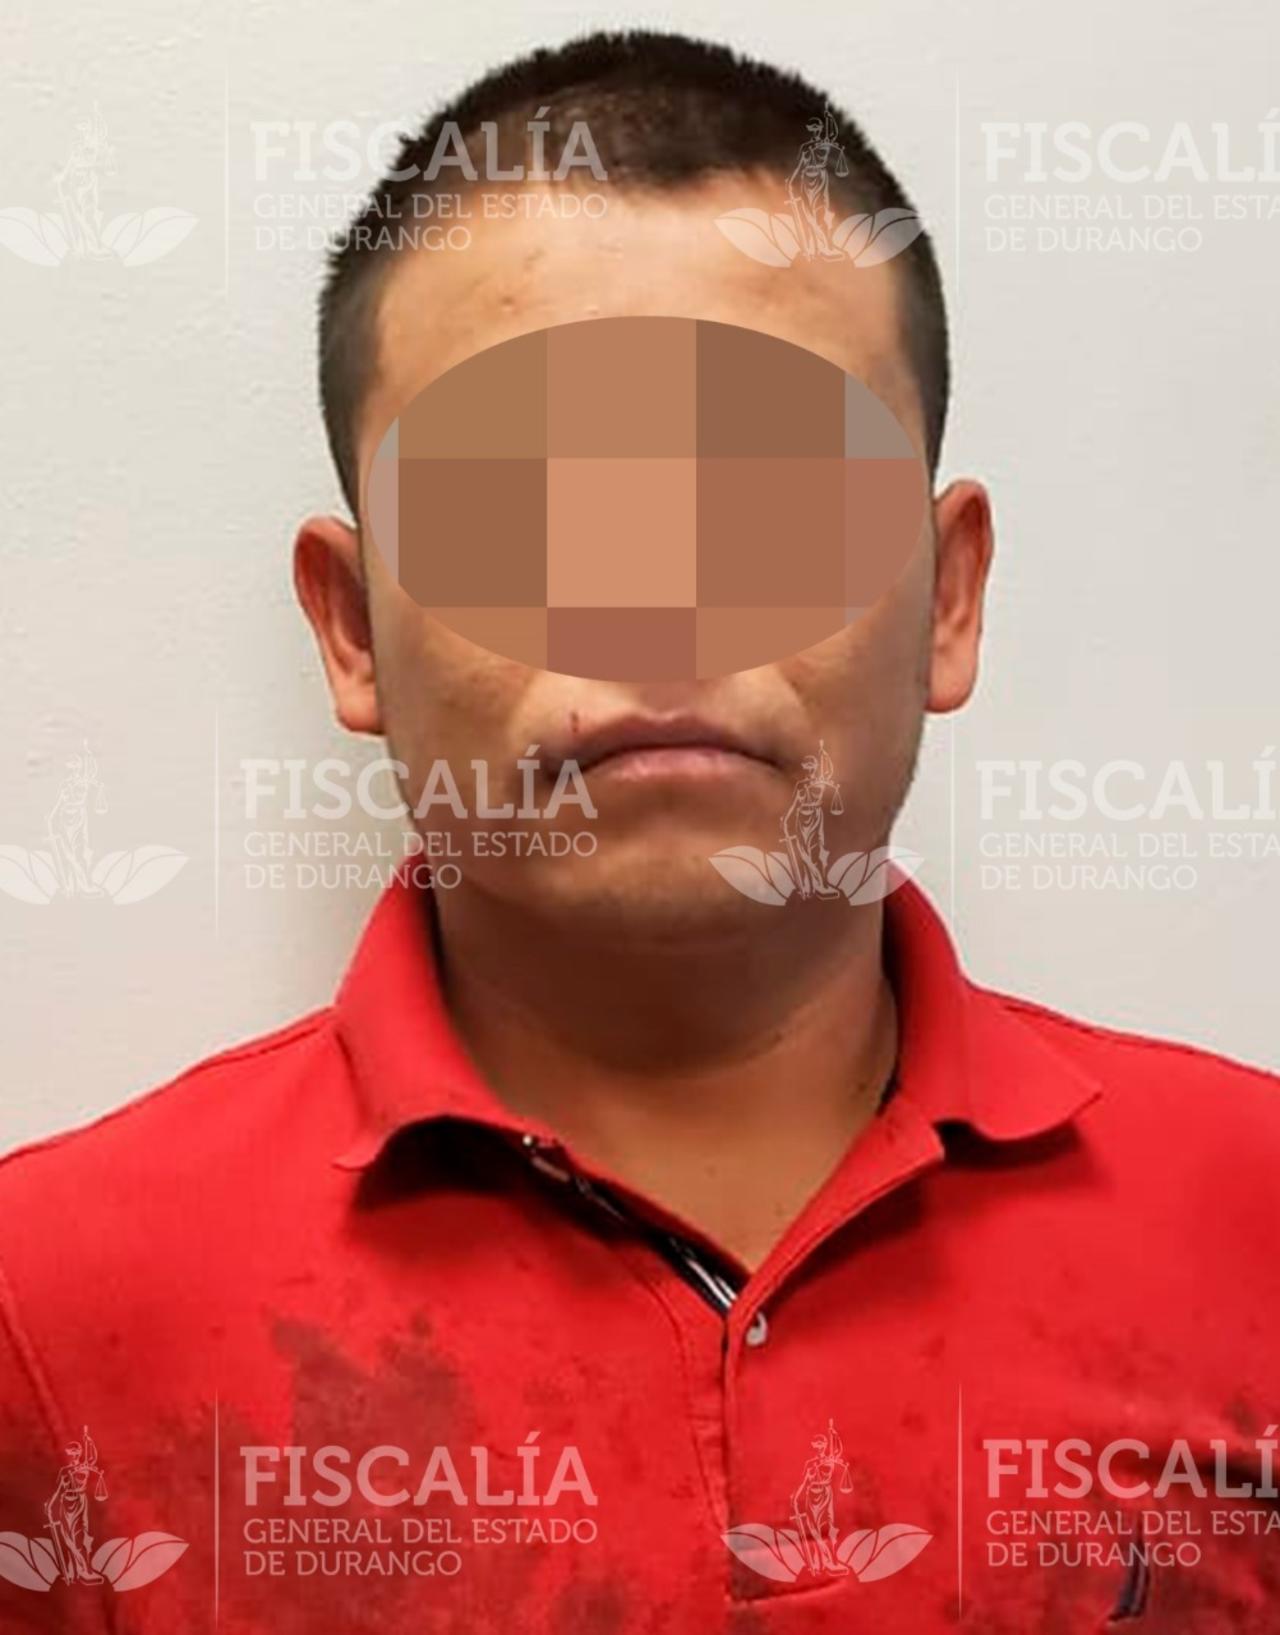 Fiscalía confirma vinculación a proceso de sujeto que golpeó a la niña Adriana